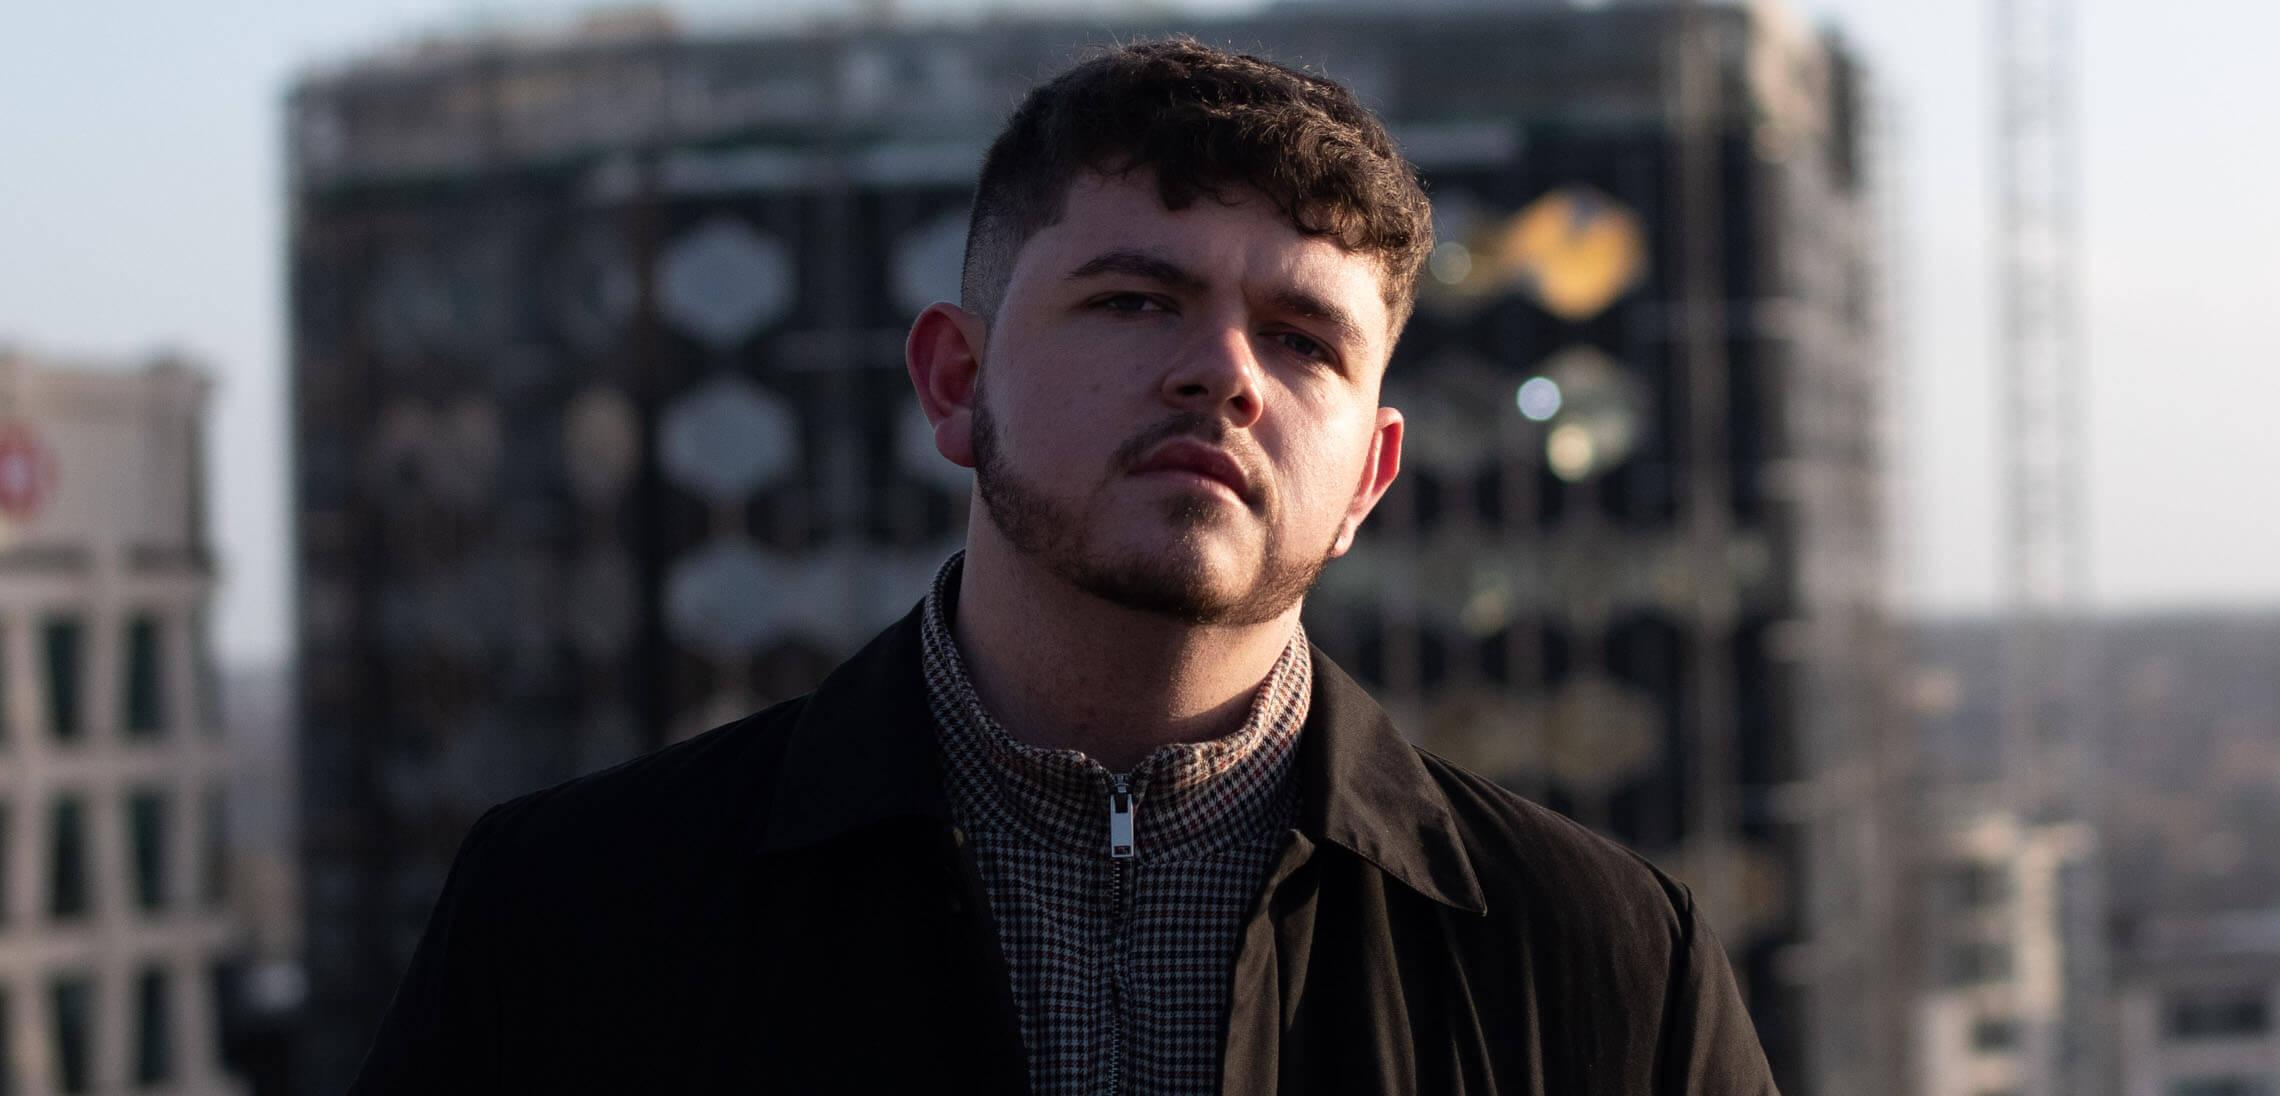 Josh Hvaal - The Sound EP hero